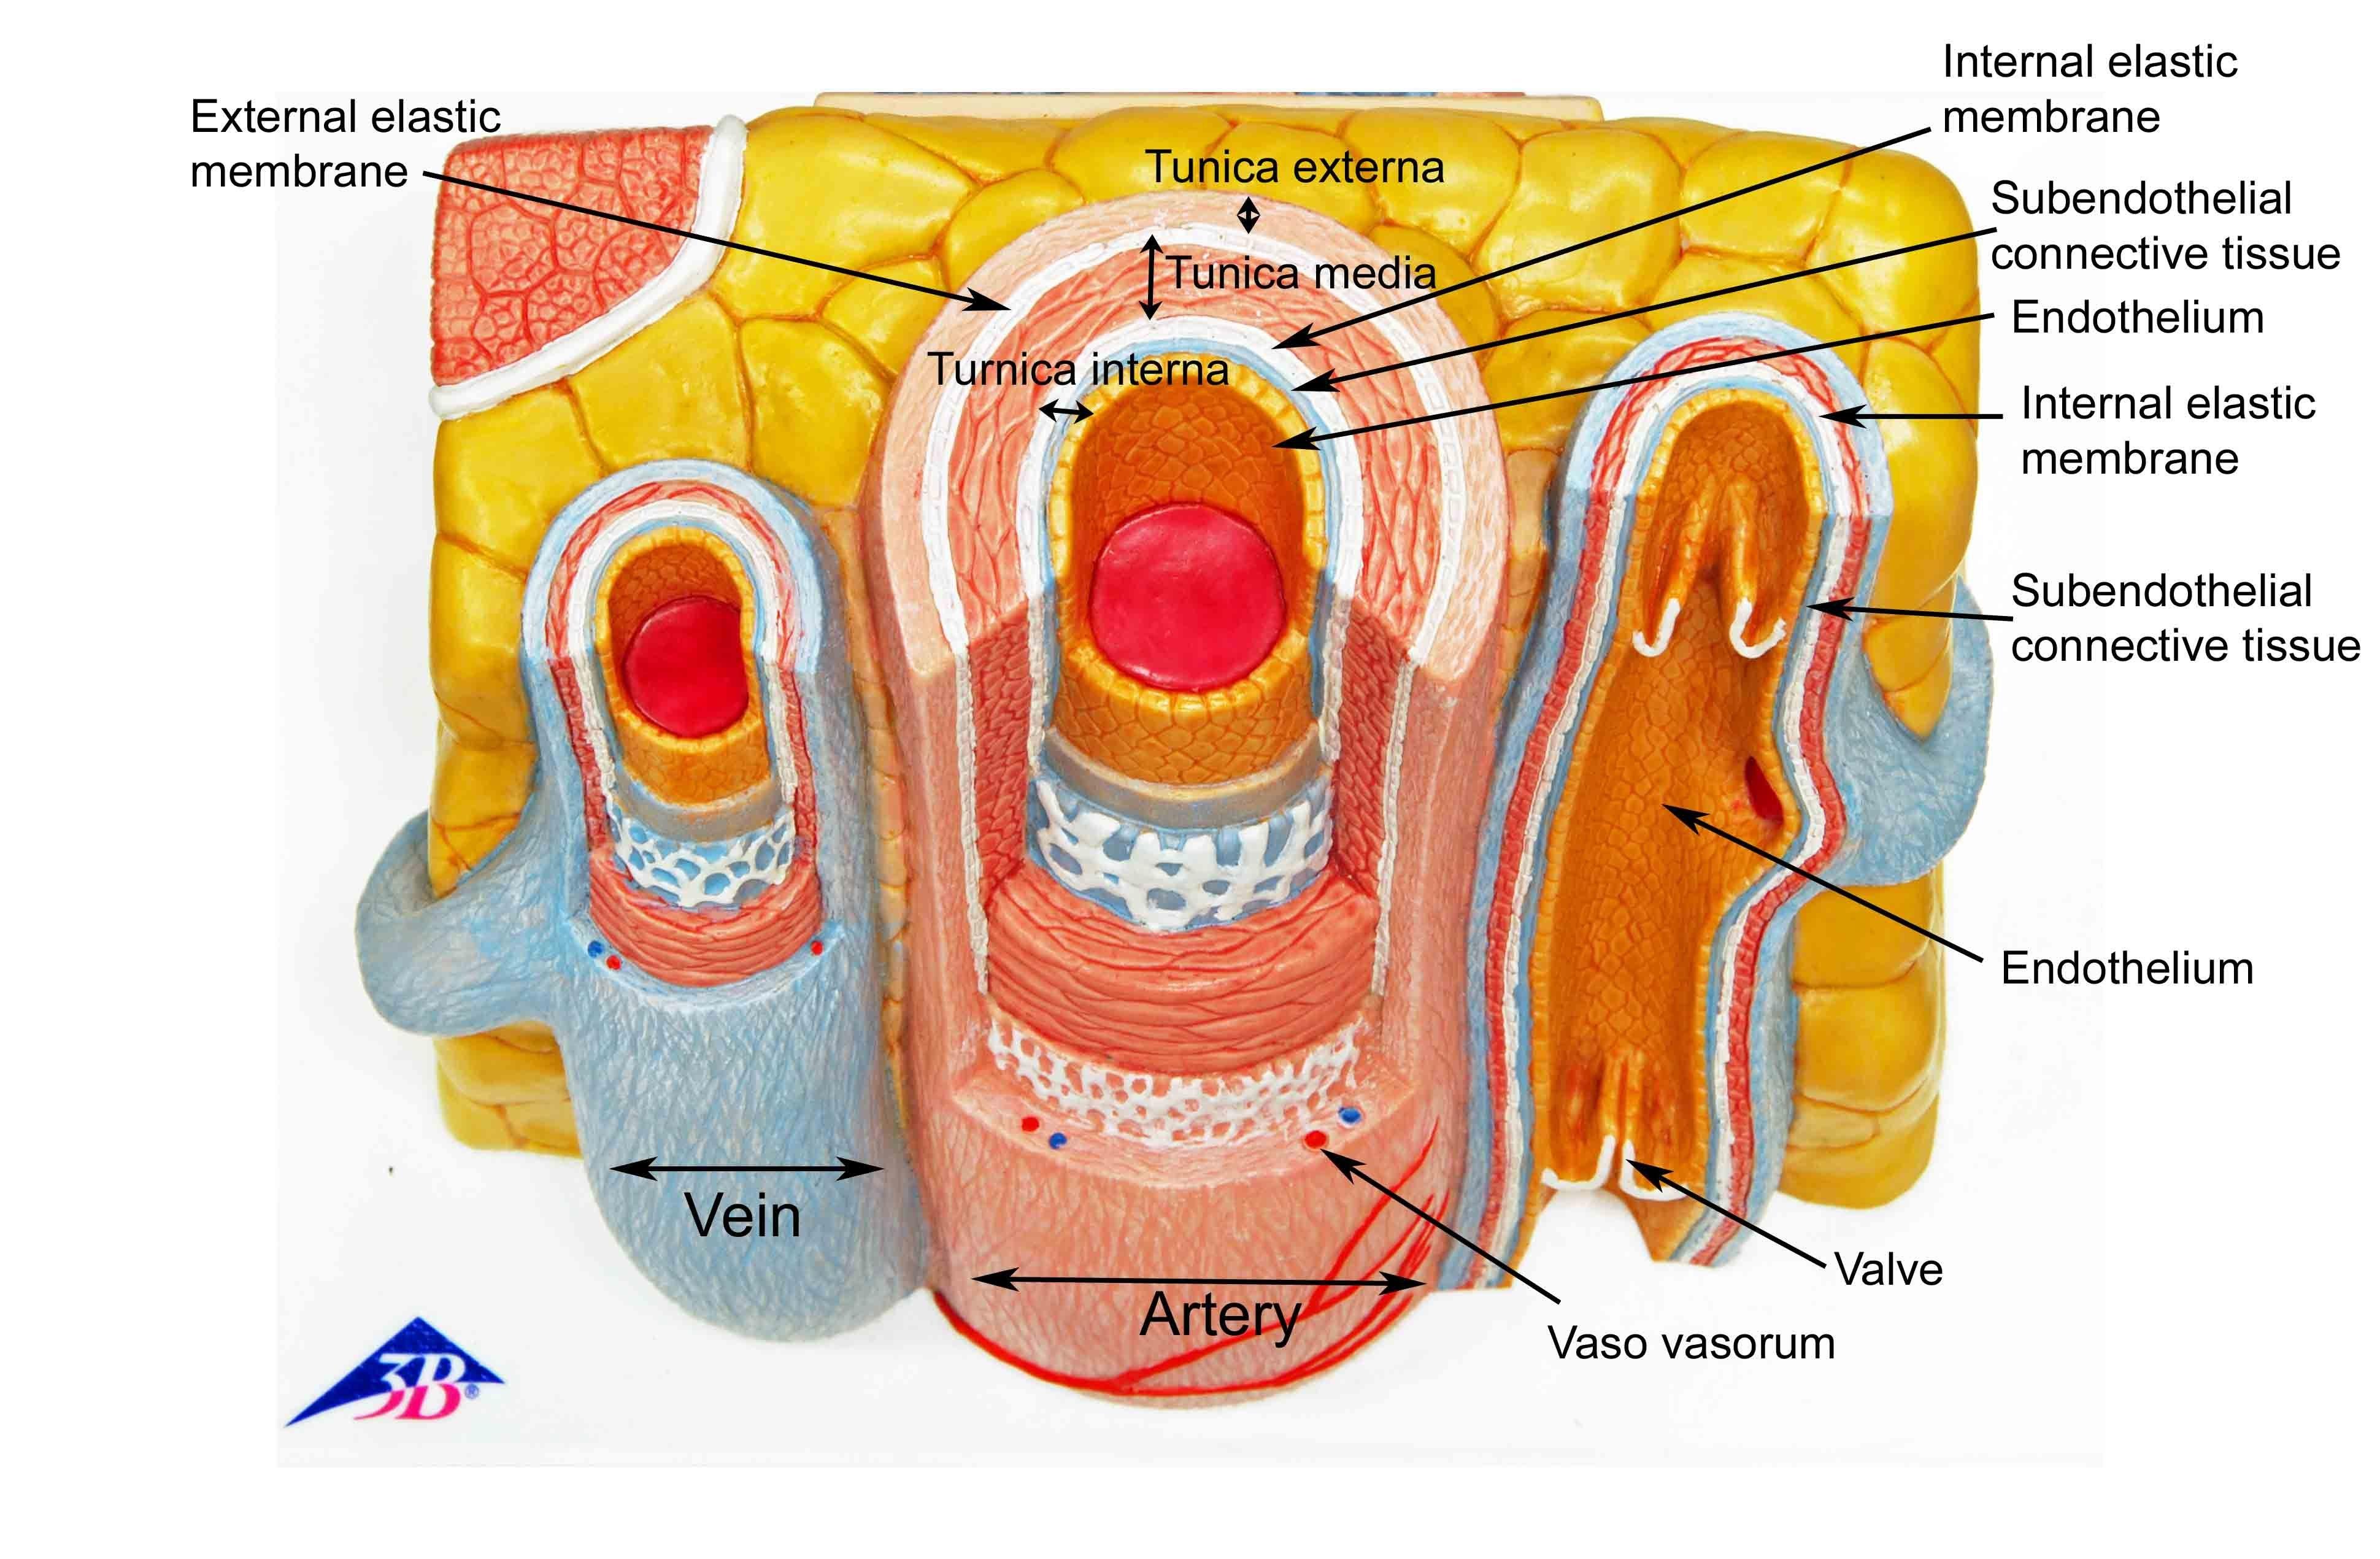 Artery And Vein Model Artery Vein Model Images Anatomy Pinterest